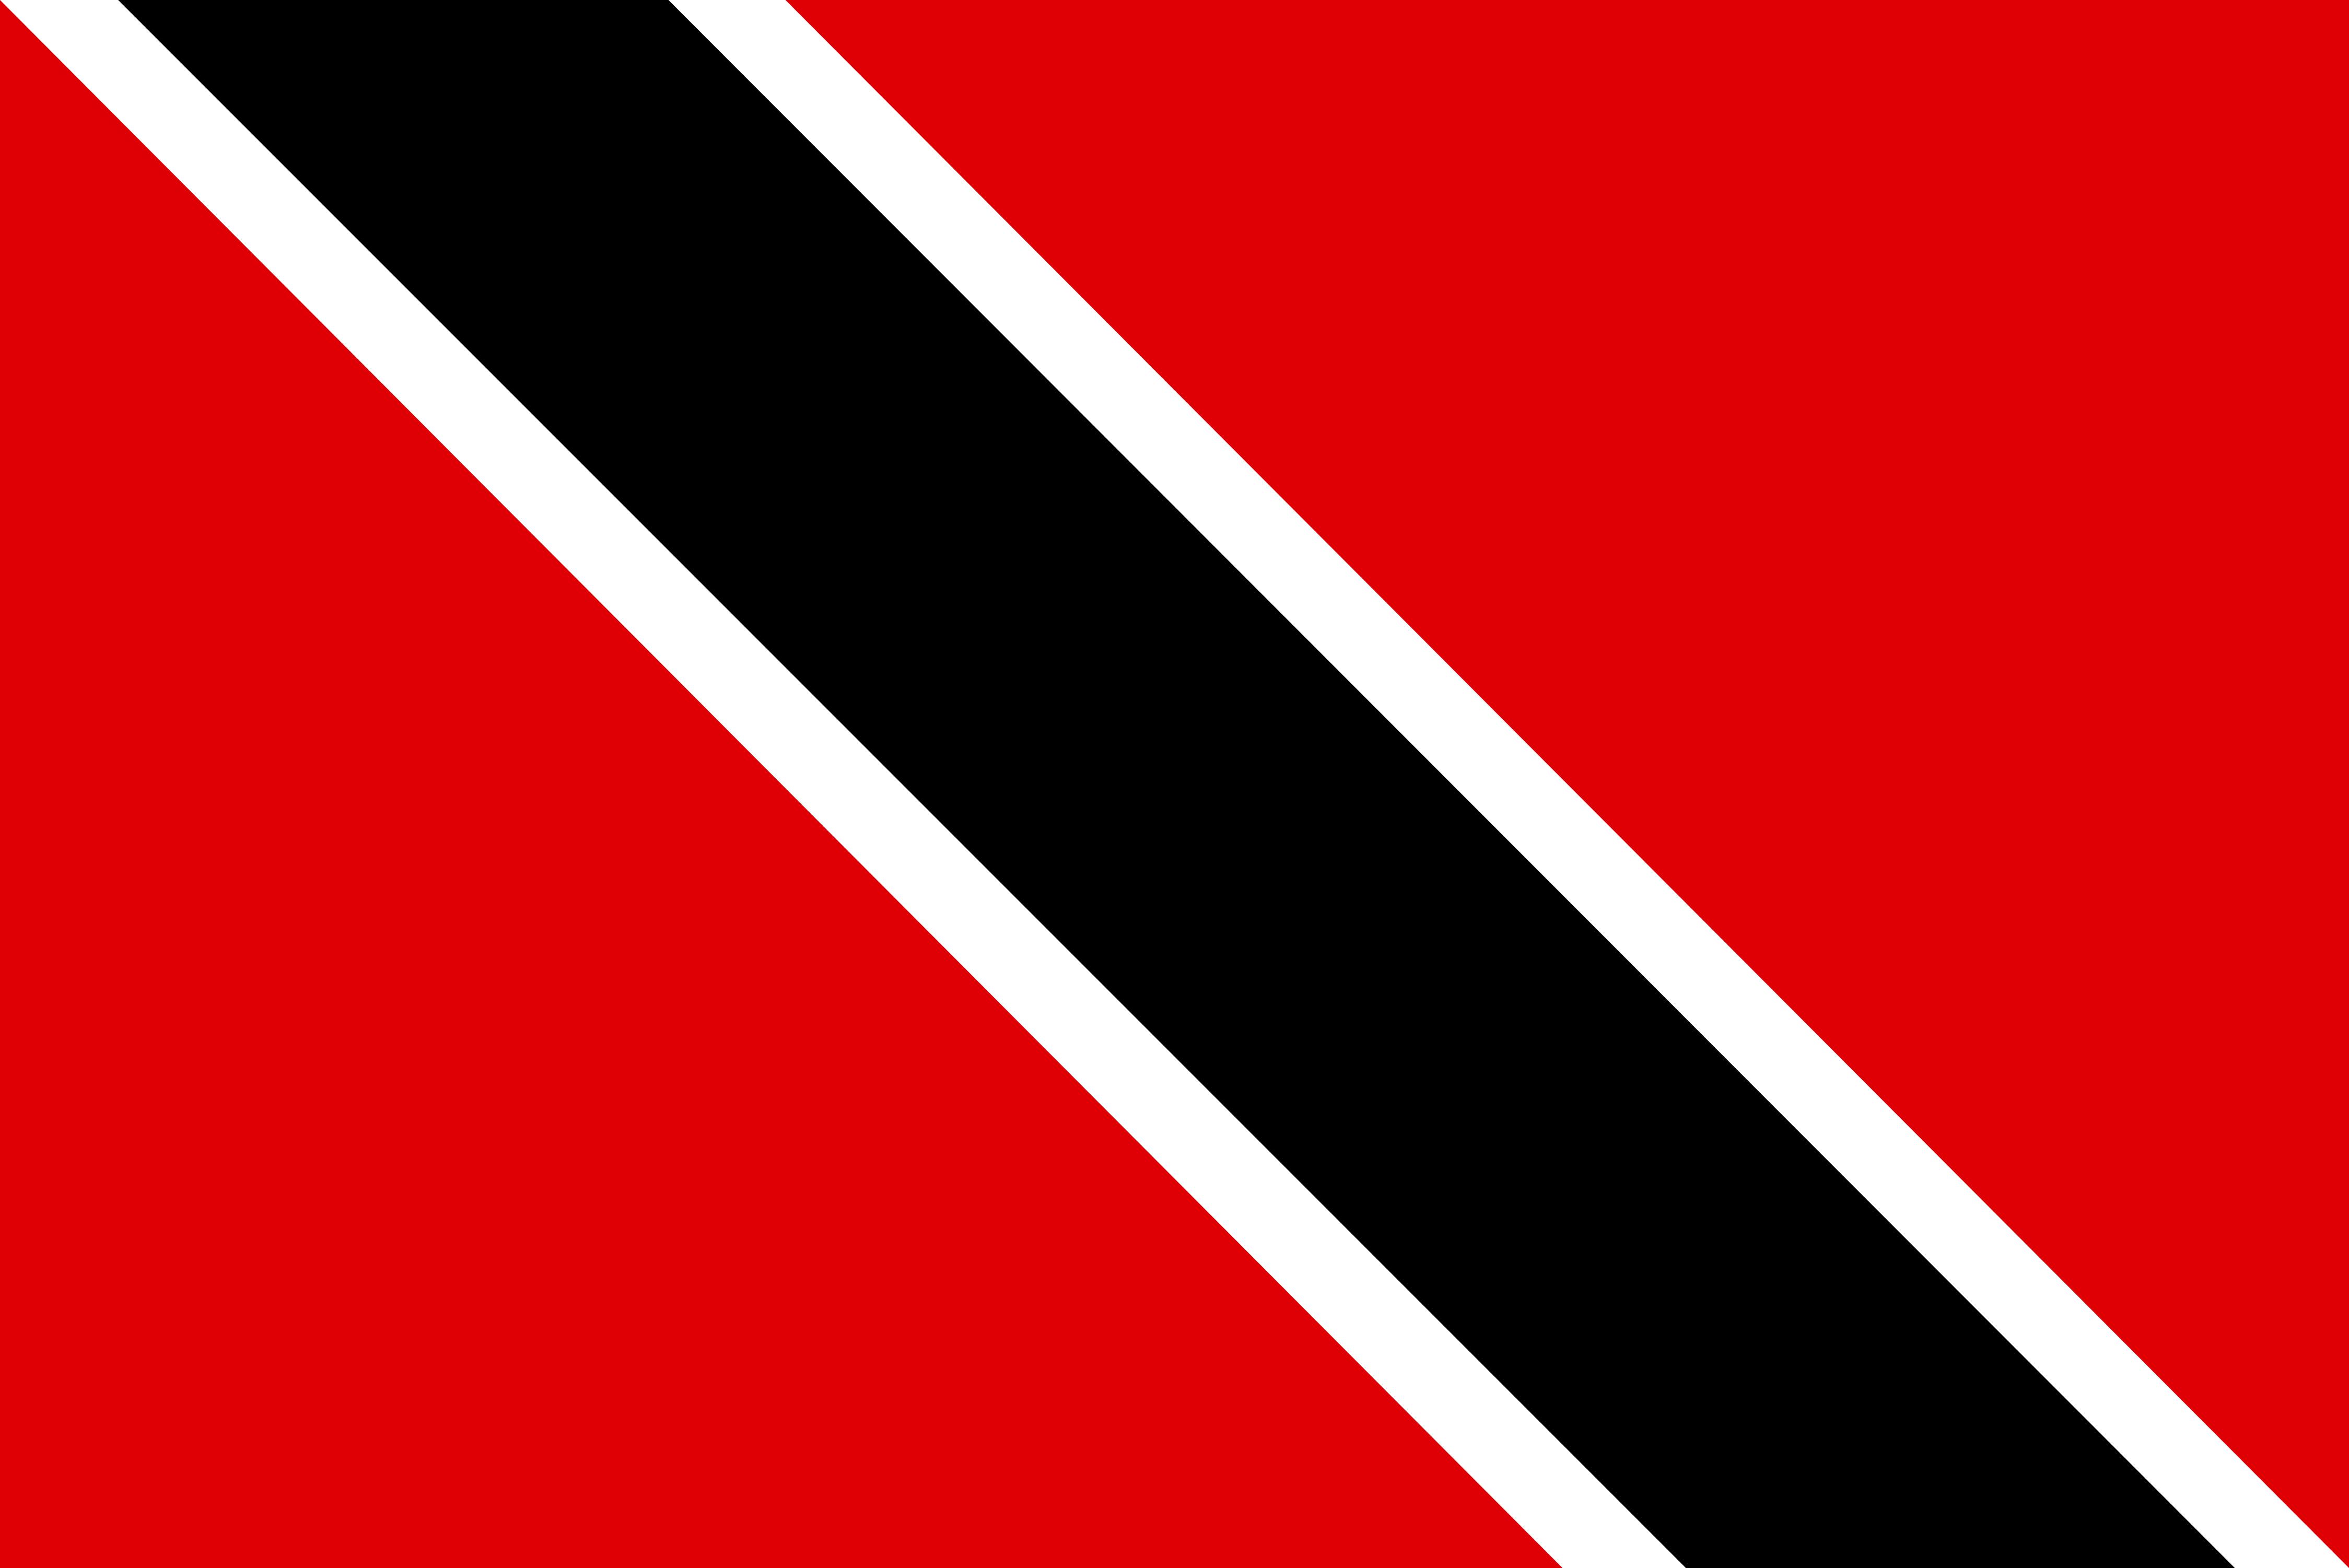 Images Trinidad and Tobago Flag Stripes 4497x3002 4497x3002